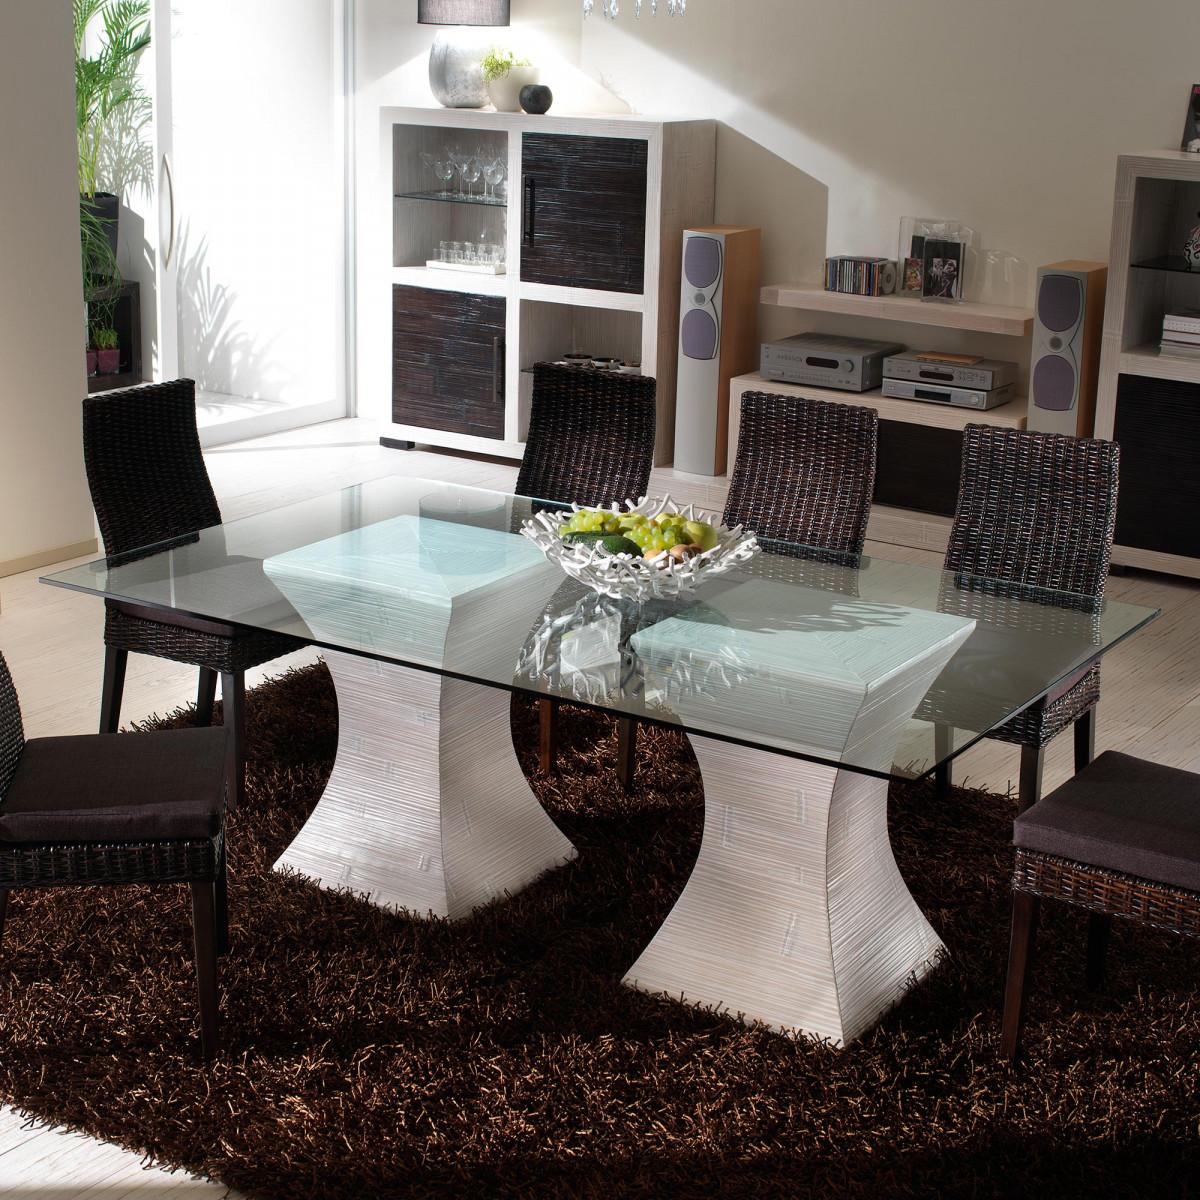 table salle a manger moderne blanc ceruse dimension 200 100 modele pacamara